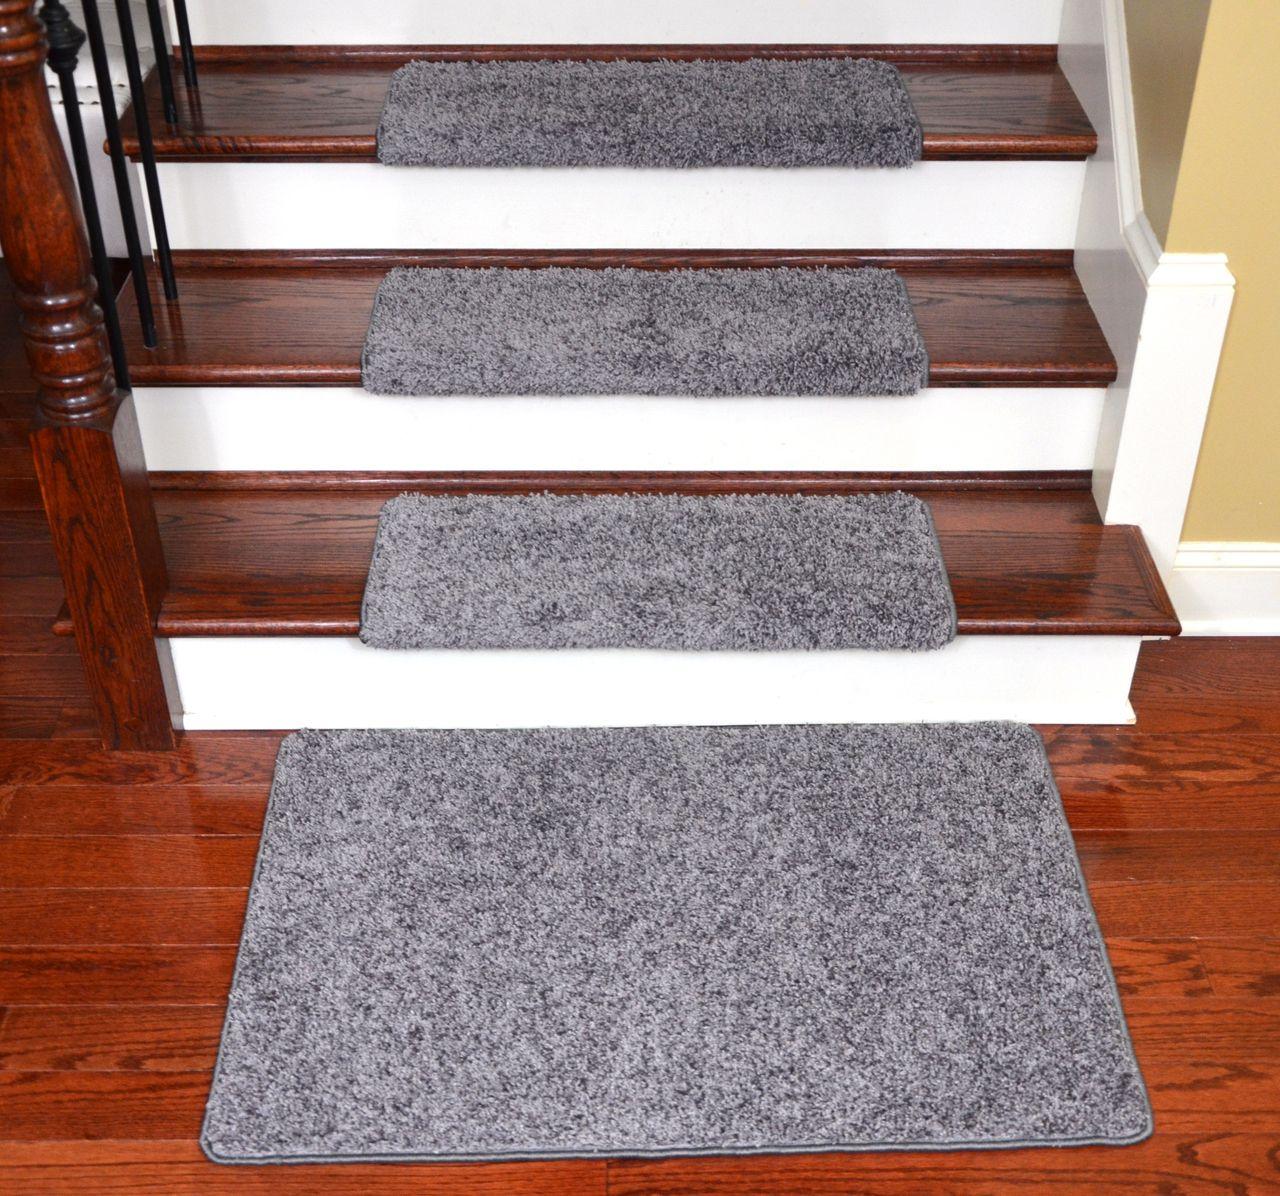 Dean Modern Diy Peel And Stick Bullnose Wraparound Non Skid Carpet | Self Stick Carpet Stair Treads | Stair Nosing | Stairway | Anti Slip | Stick Bullnose Wraparound | Beaudoin Utility Peel